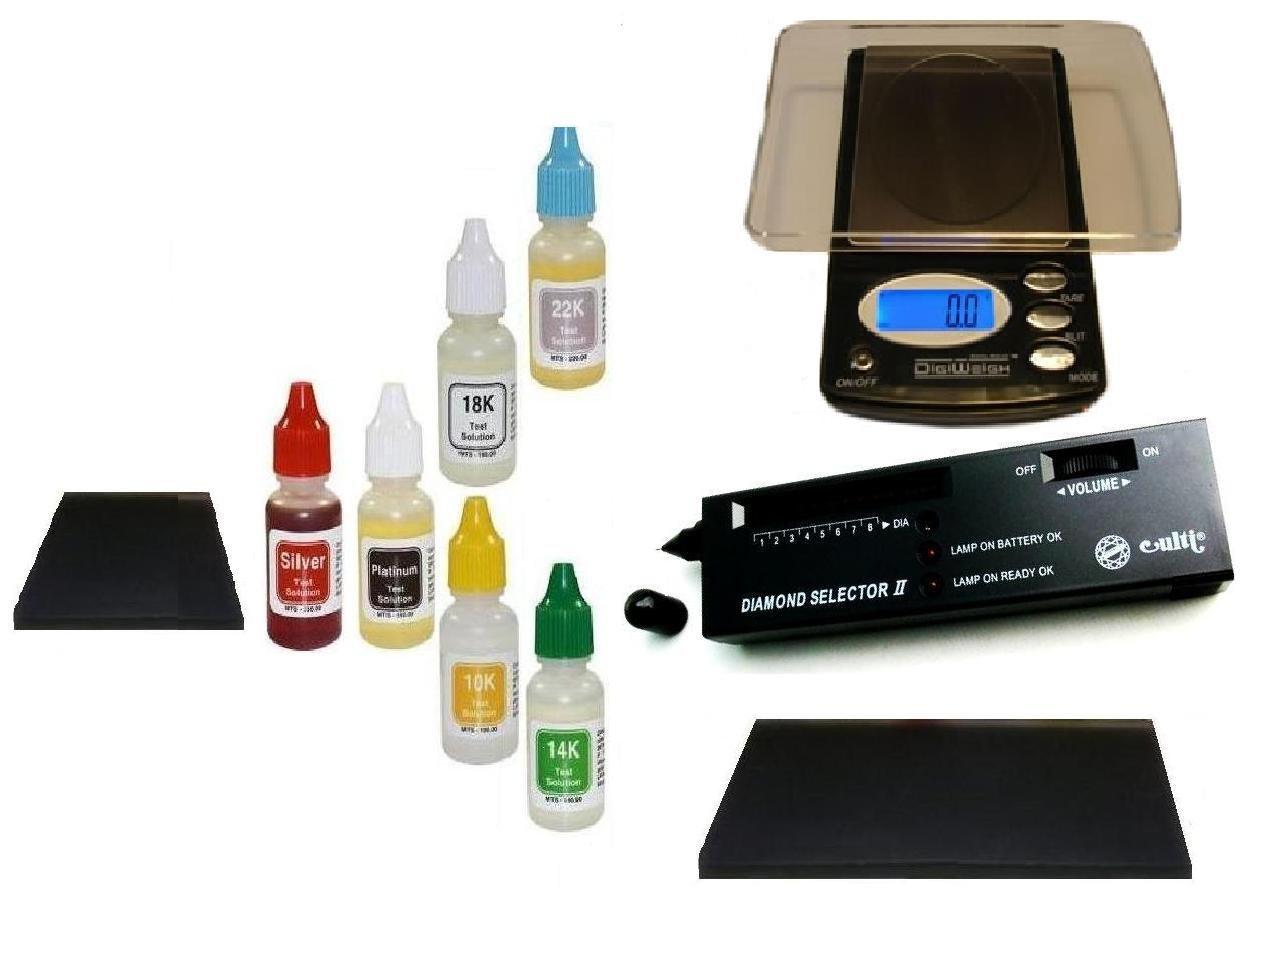 jewelry allergy alternatives nickel free test kit